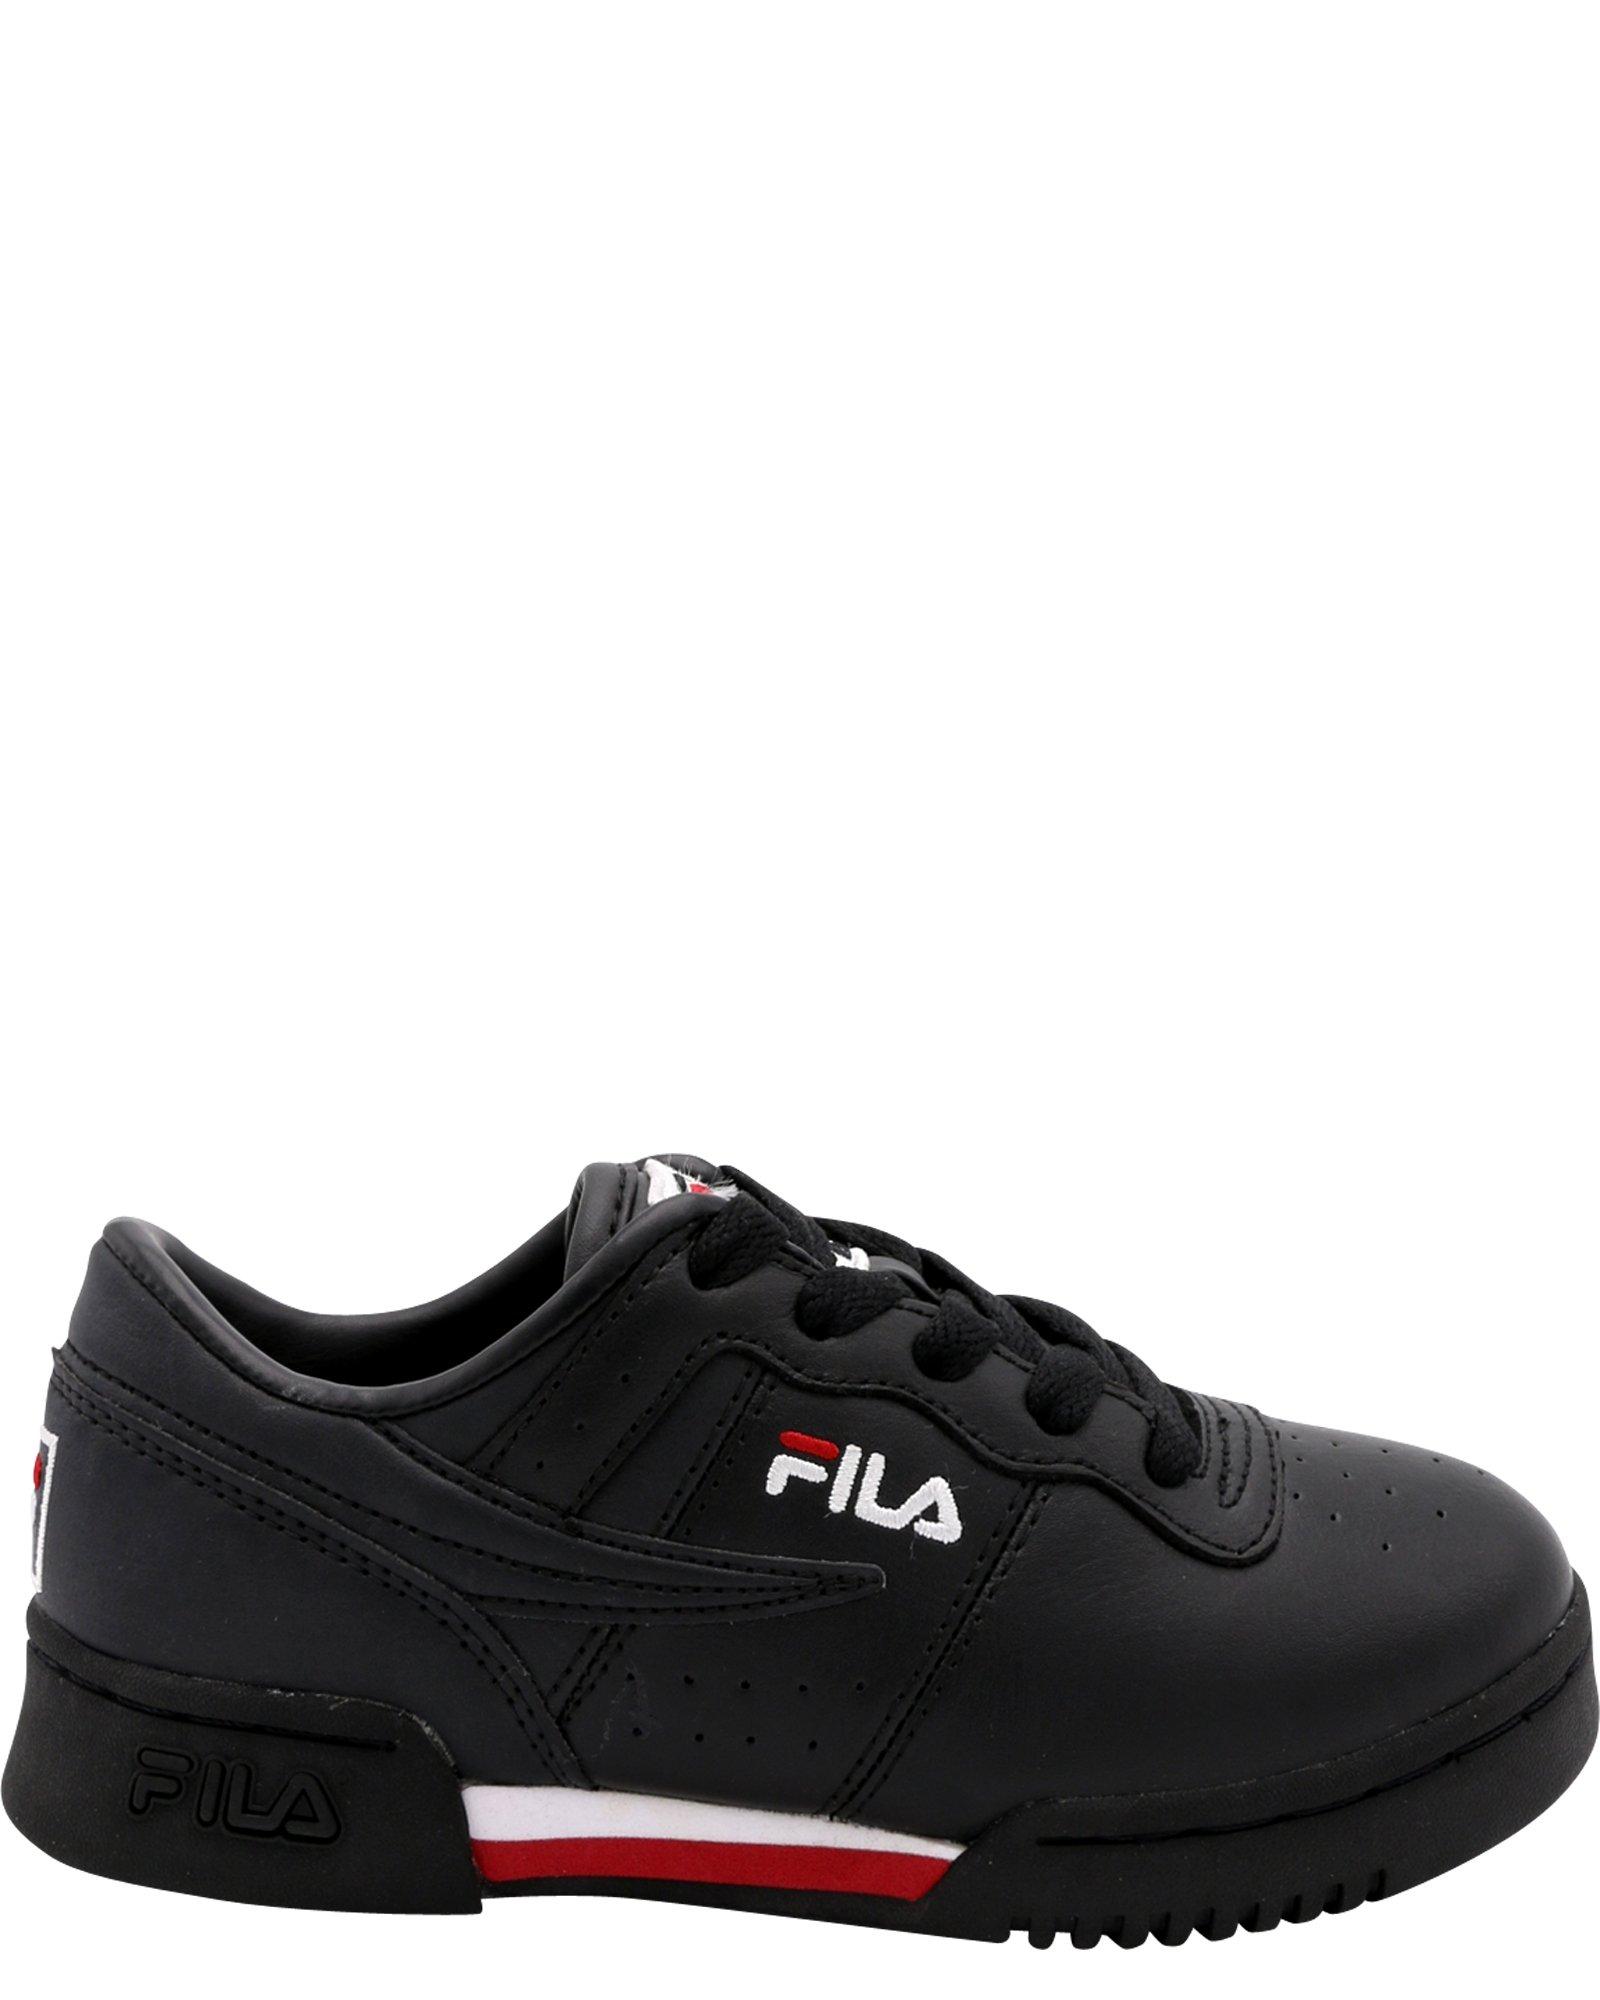 Fila Kid's Original Fitness Sneakers Black/White/Fila Red 1